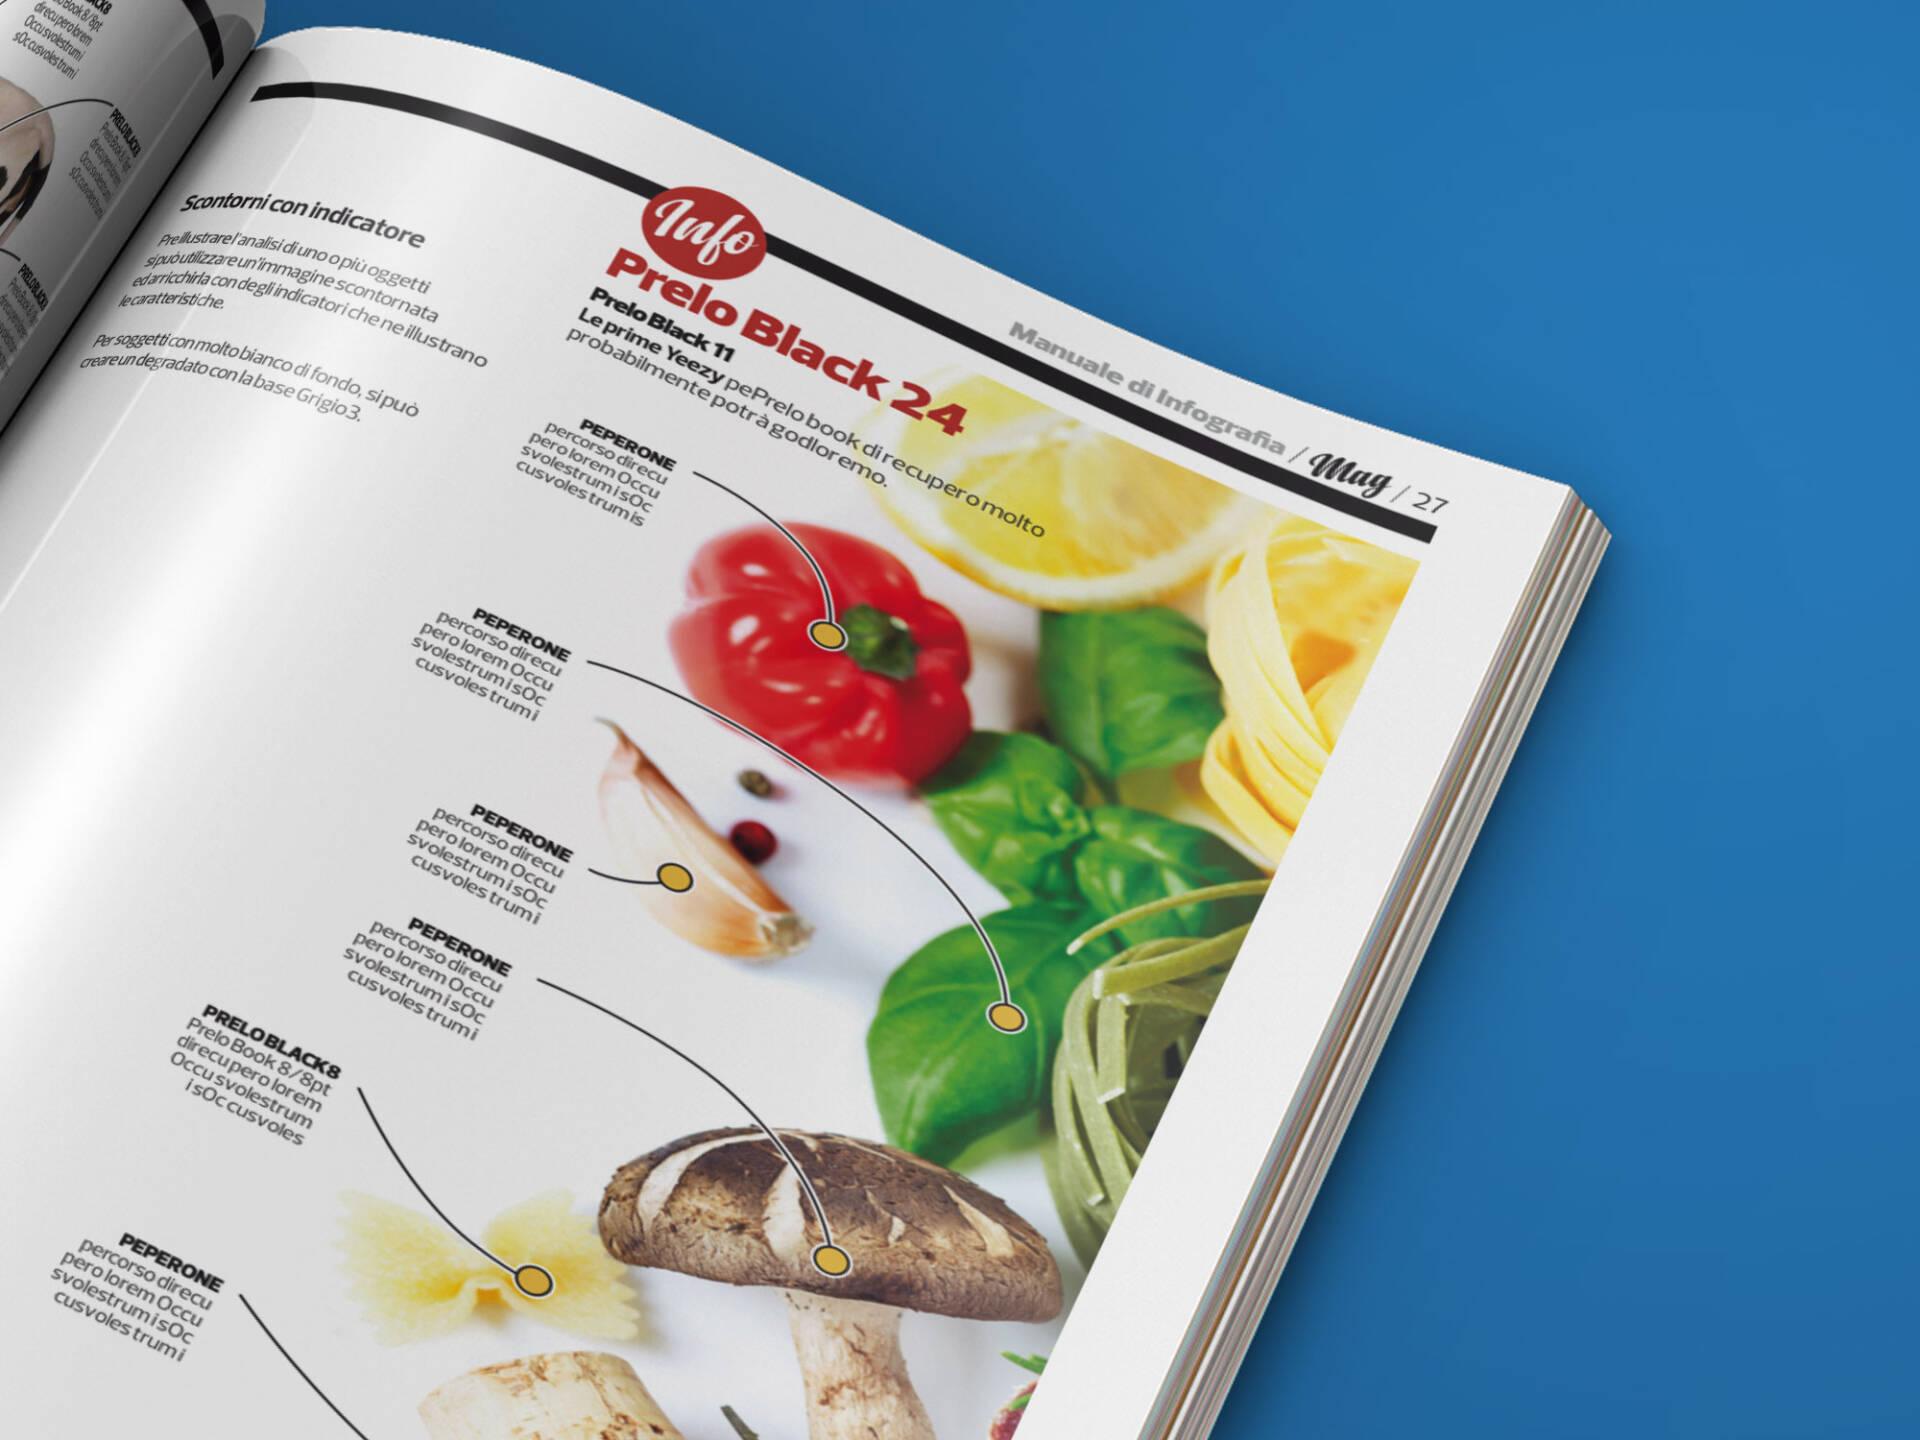 MAG_infographics_01_Wenceslau_News_Design